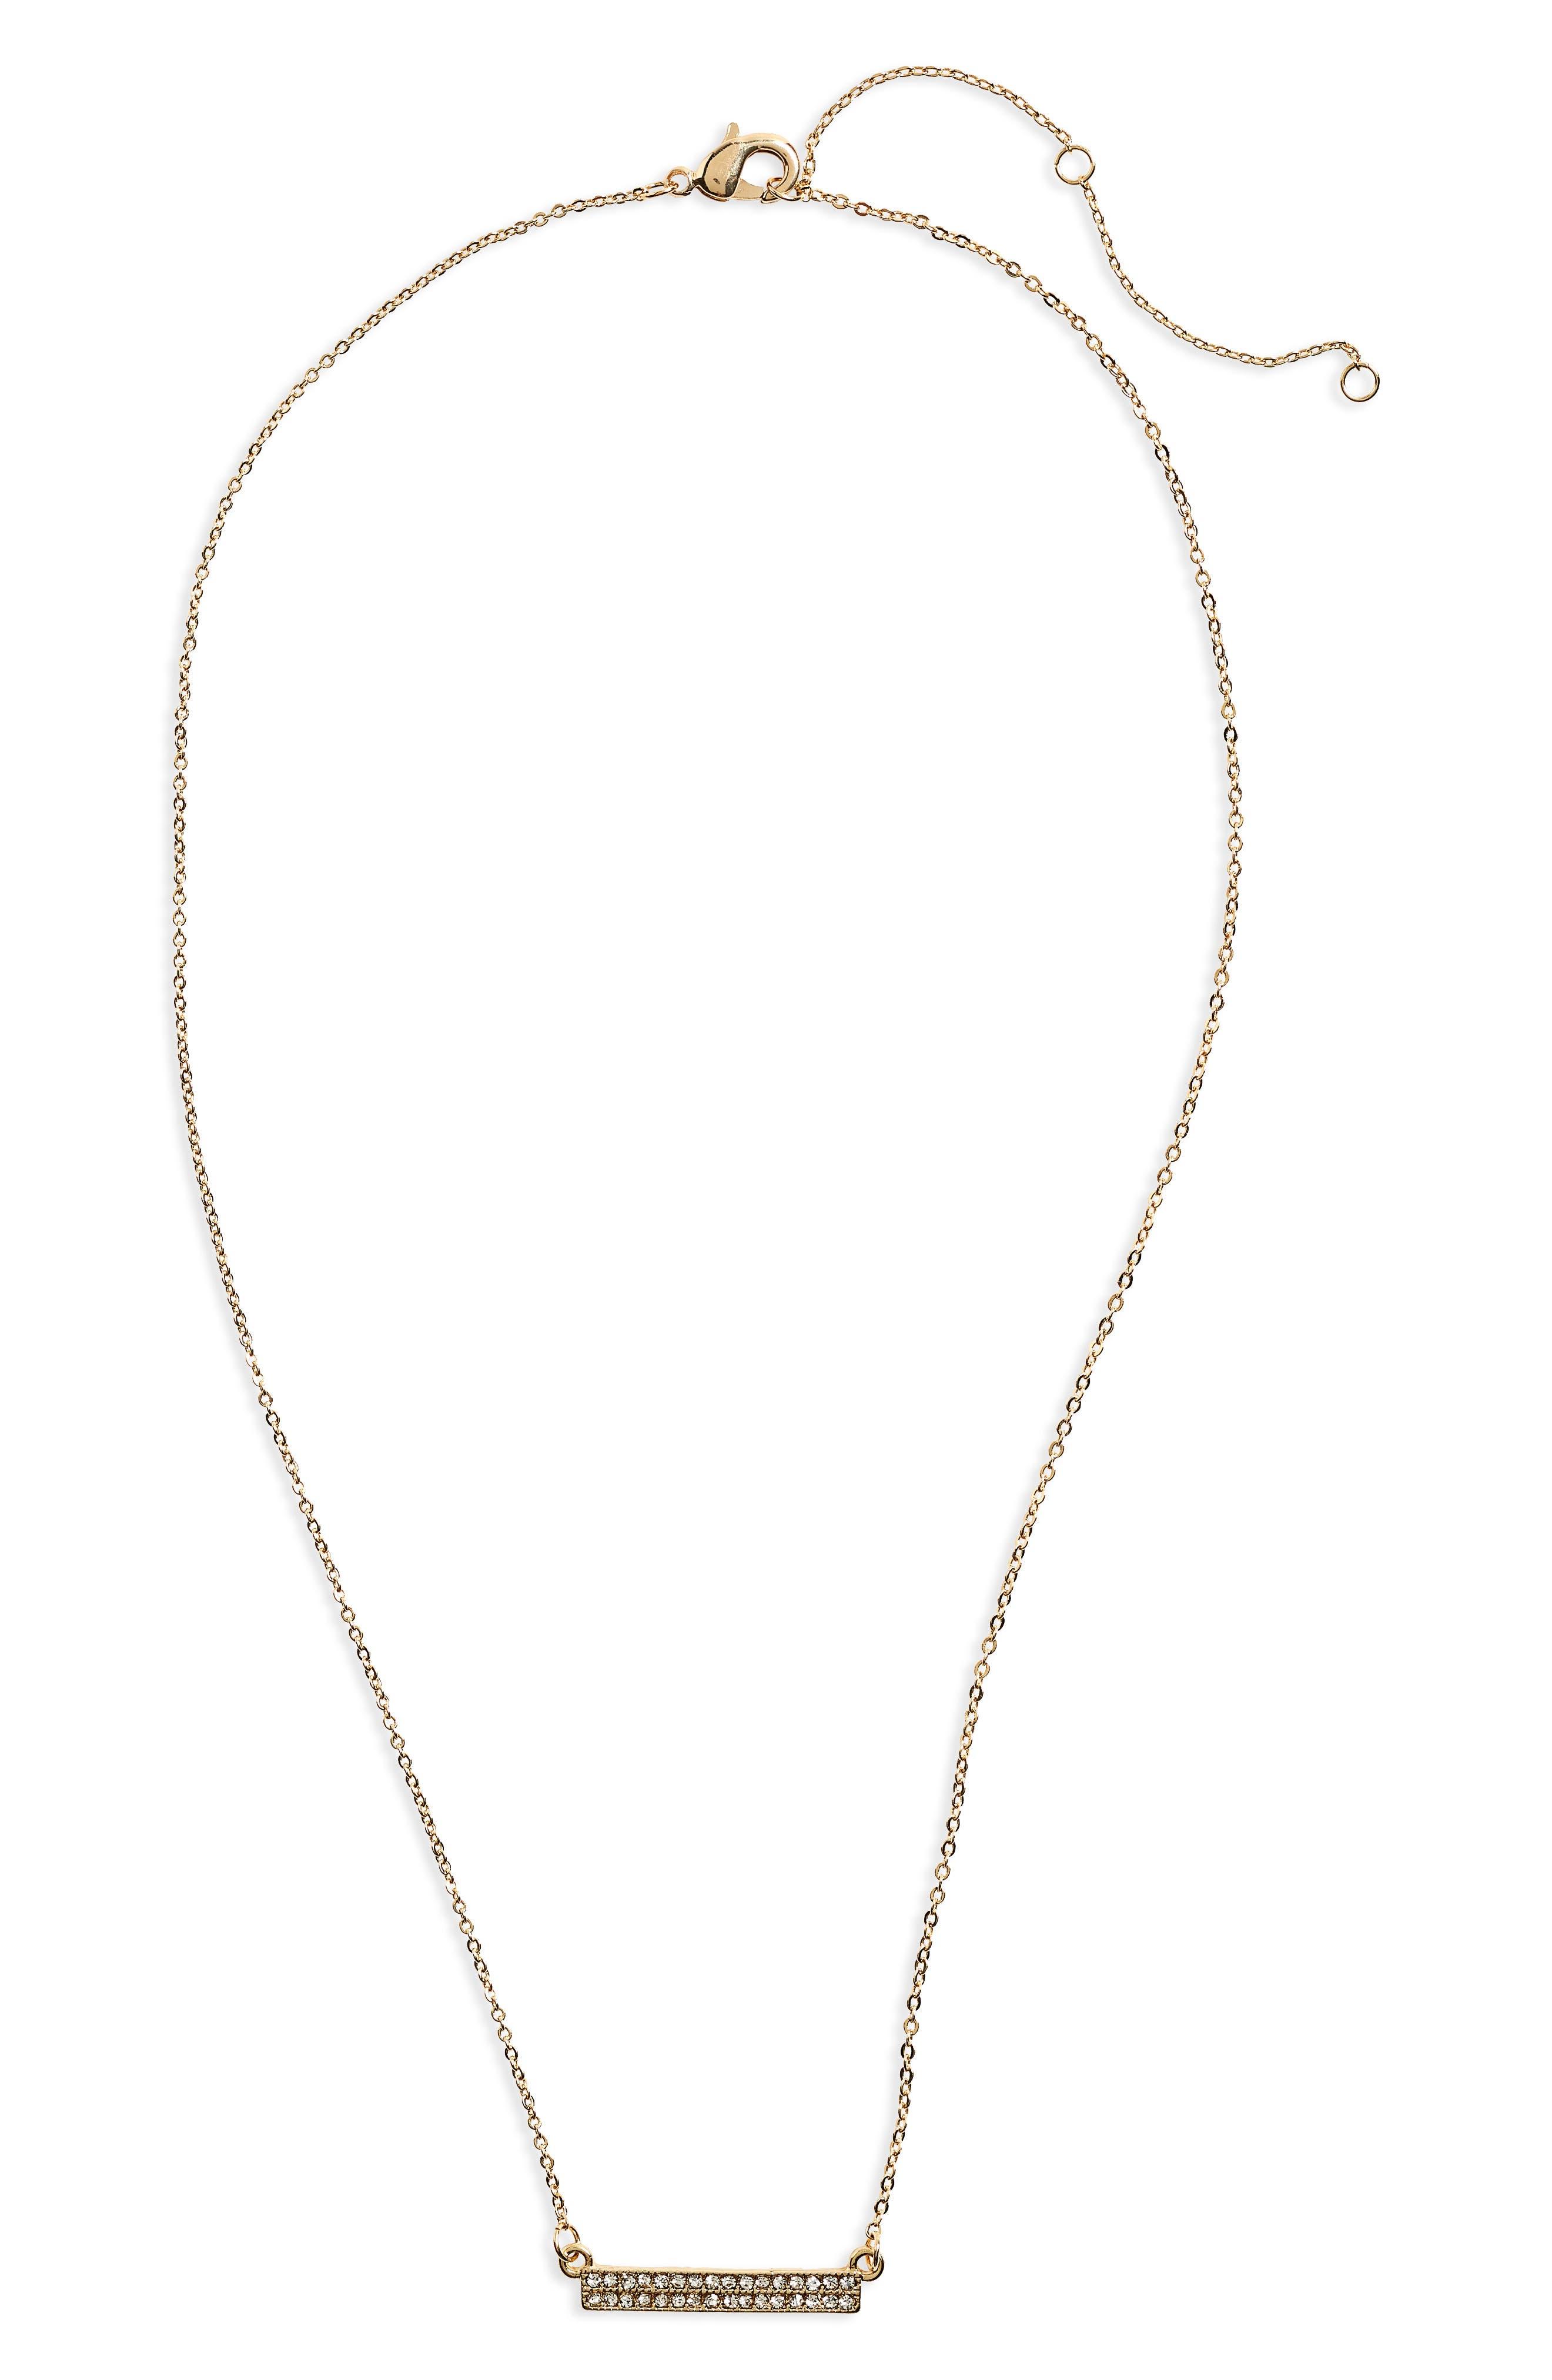 Crystal Bar Pendant Necklace,                             Main thumbnail 1, color,                             710